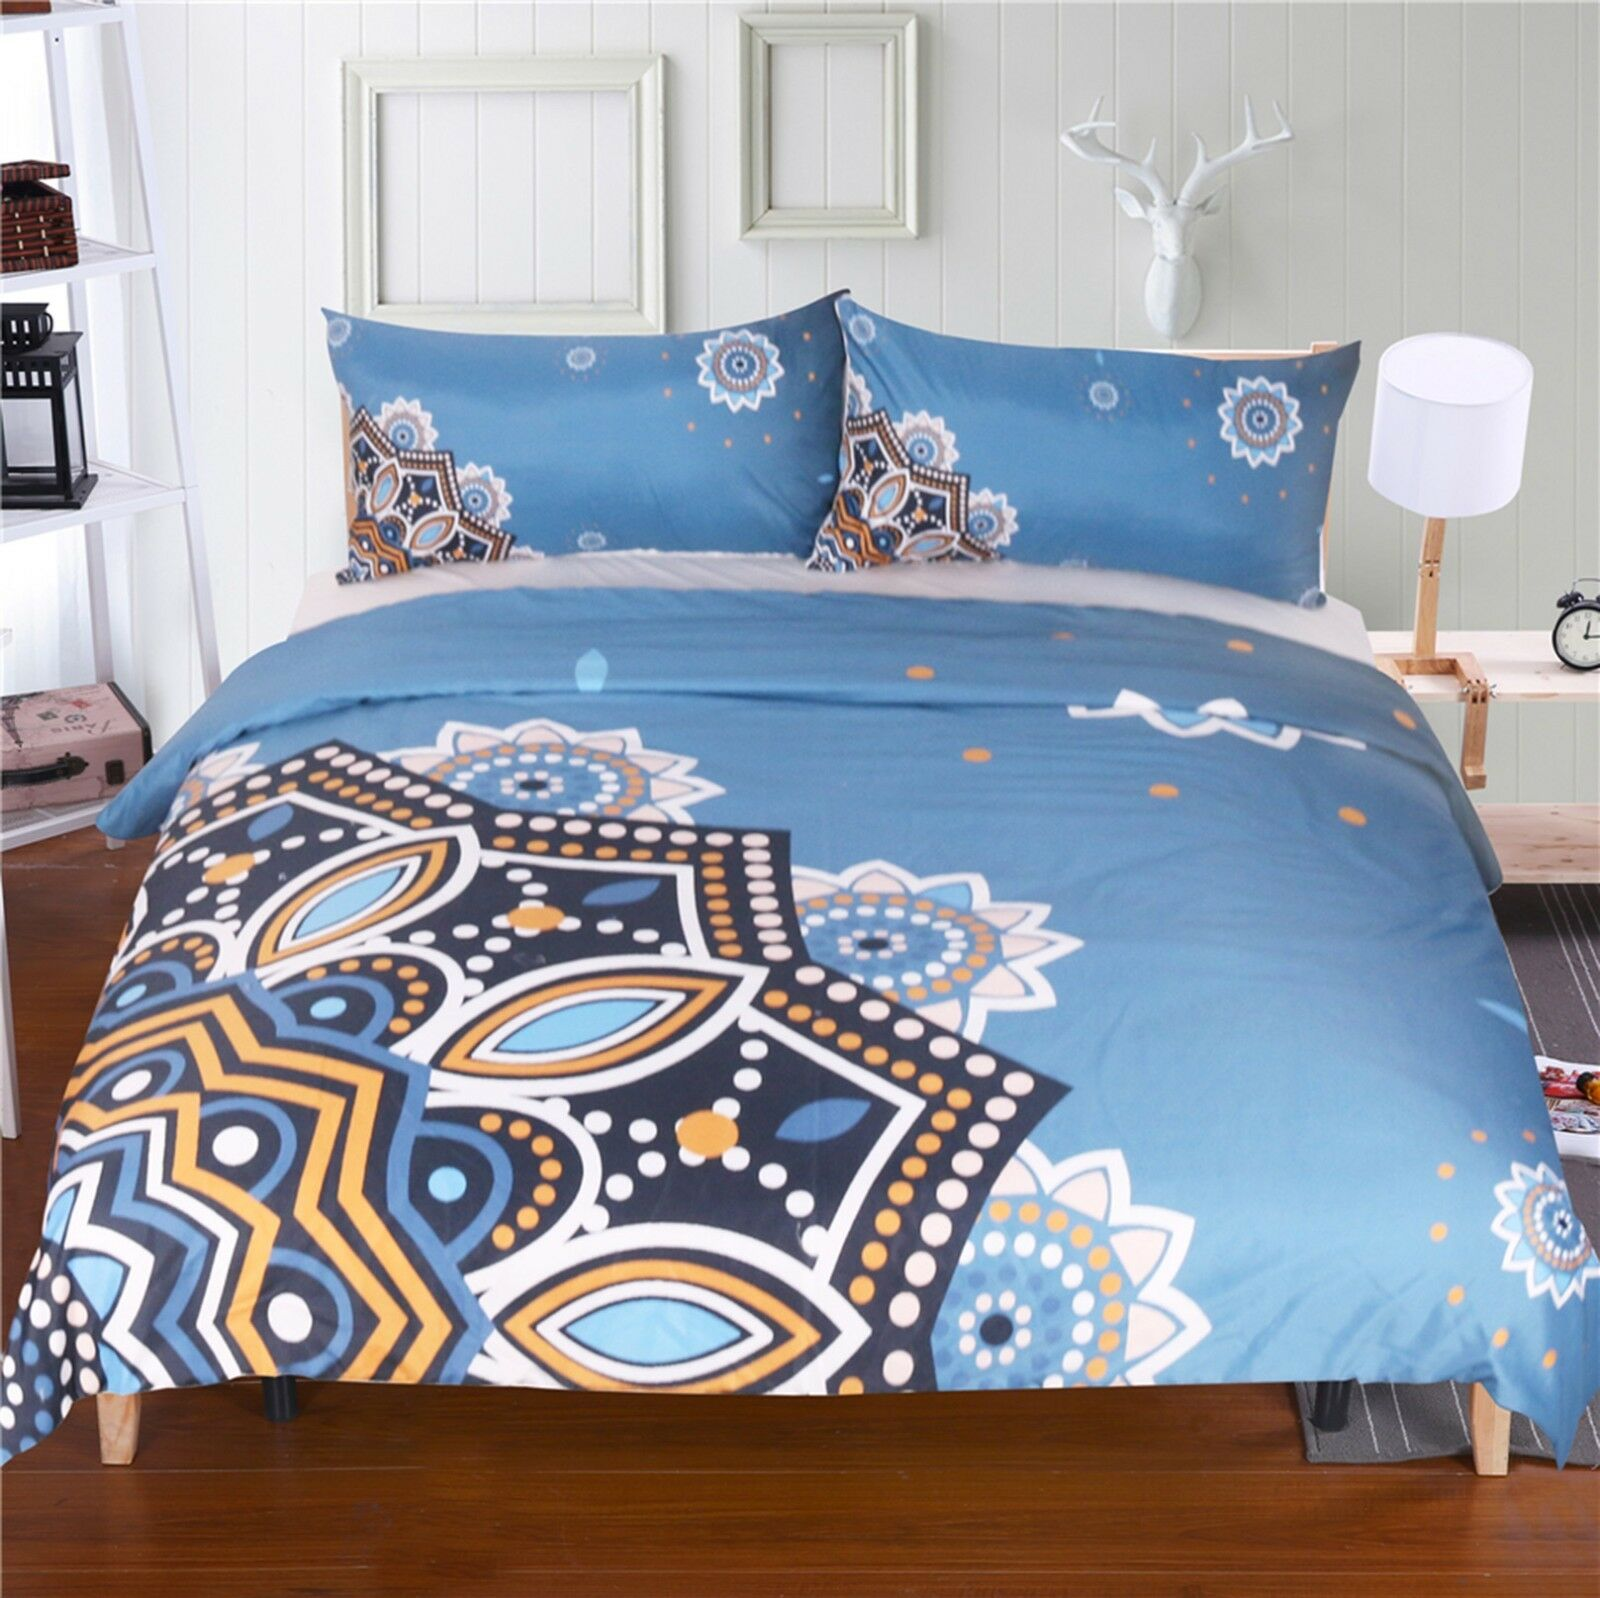 3D Flower Pattern 69 Bed Pillowcases Quilt Duvet Cover Set Single Queen King AU